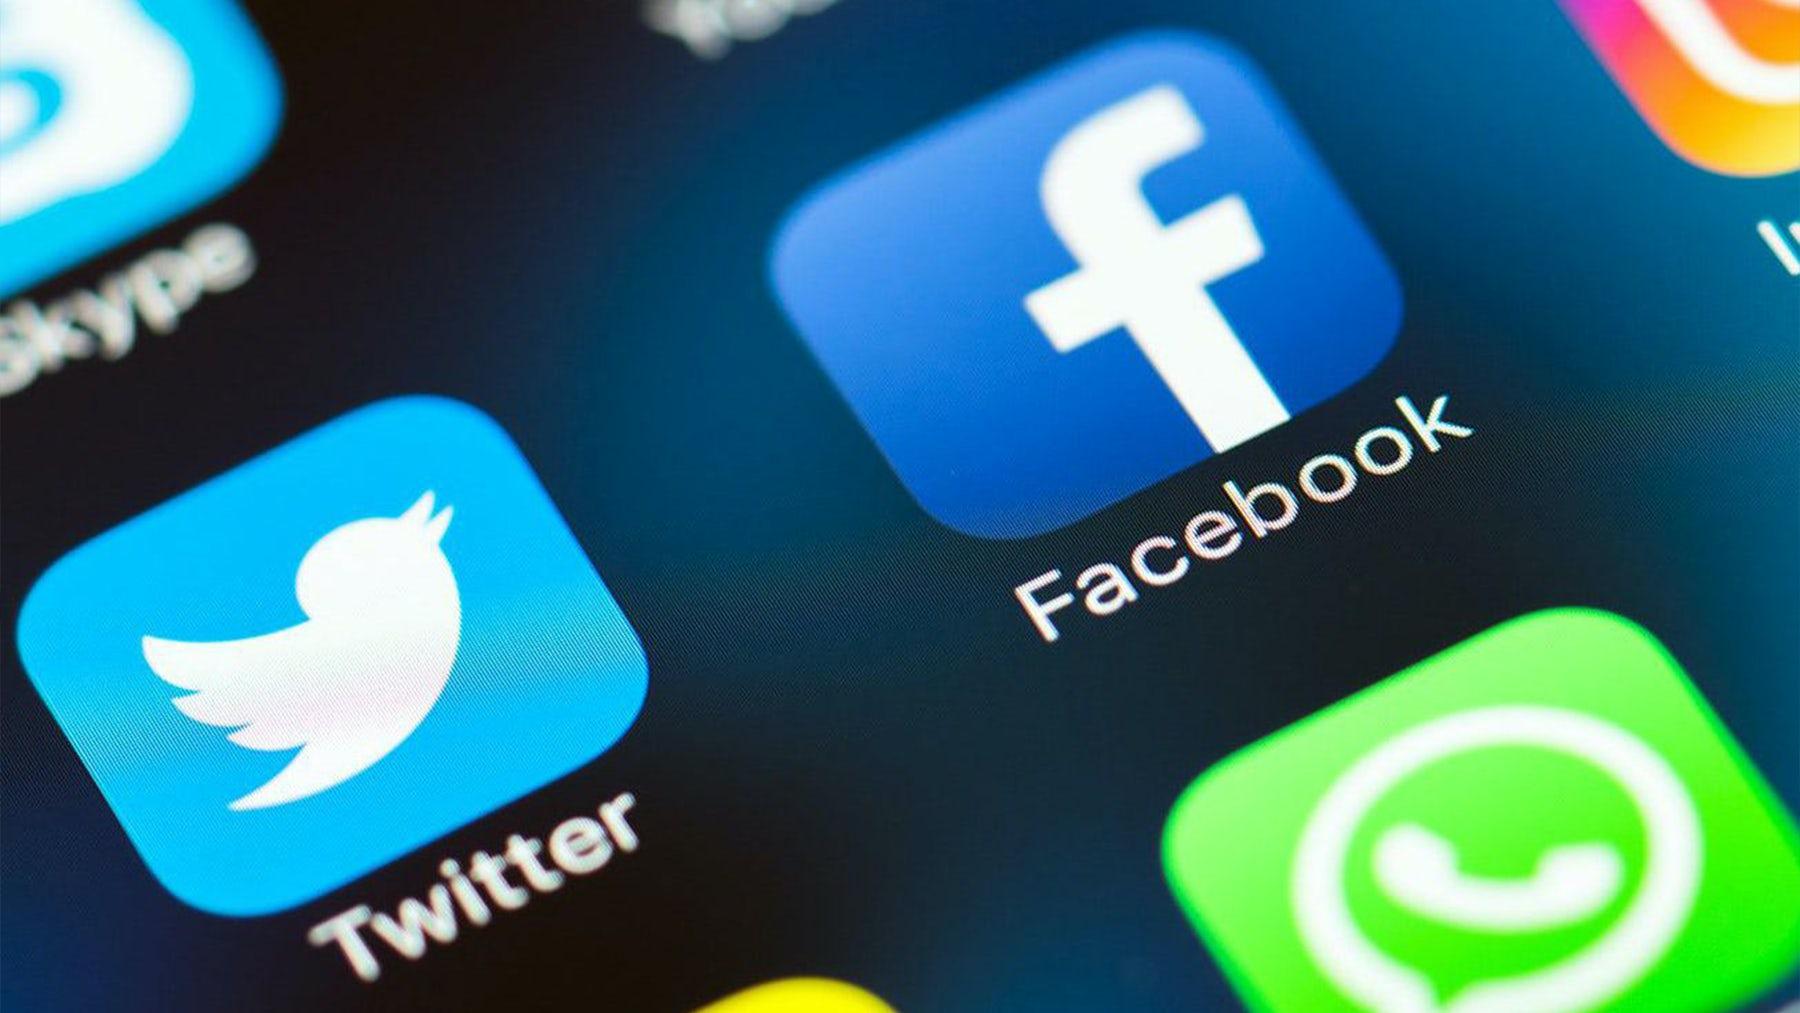 Twitter and Facebook apps. Shutterstock.